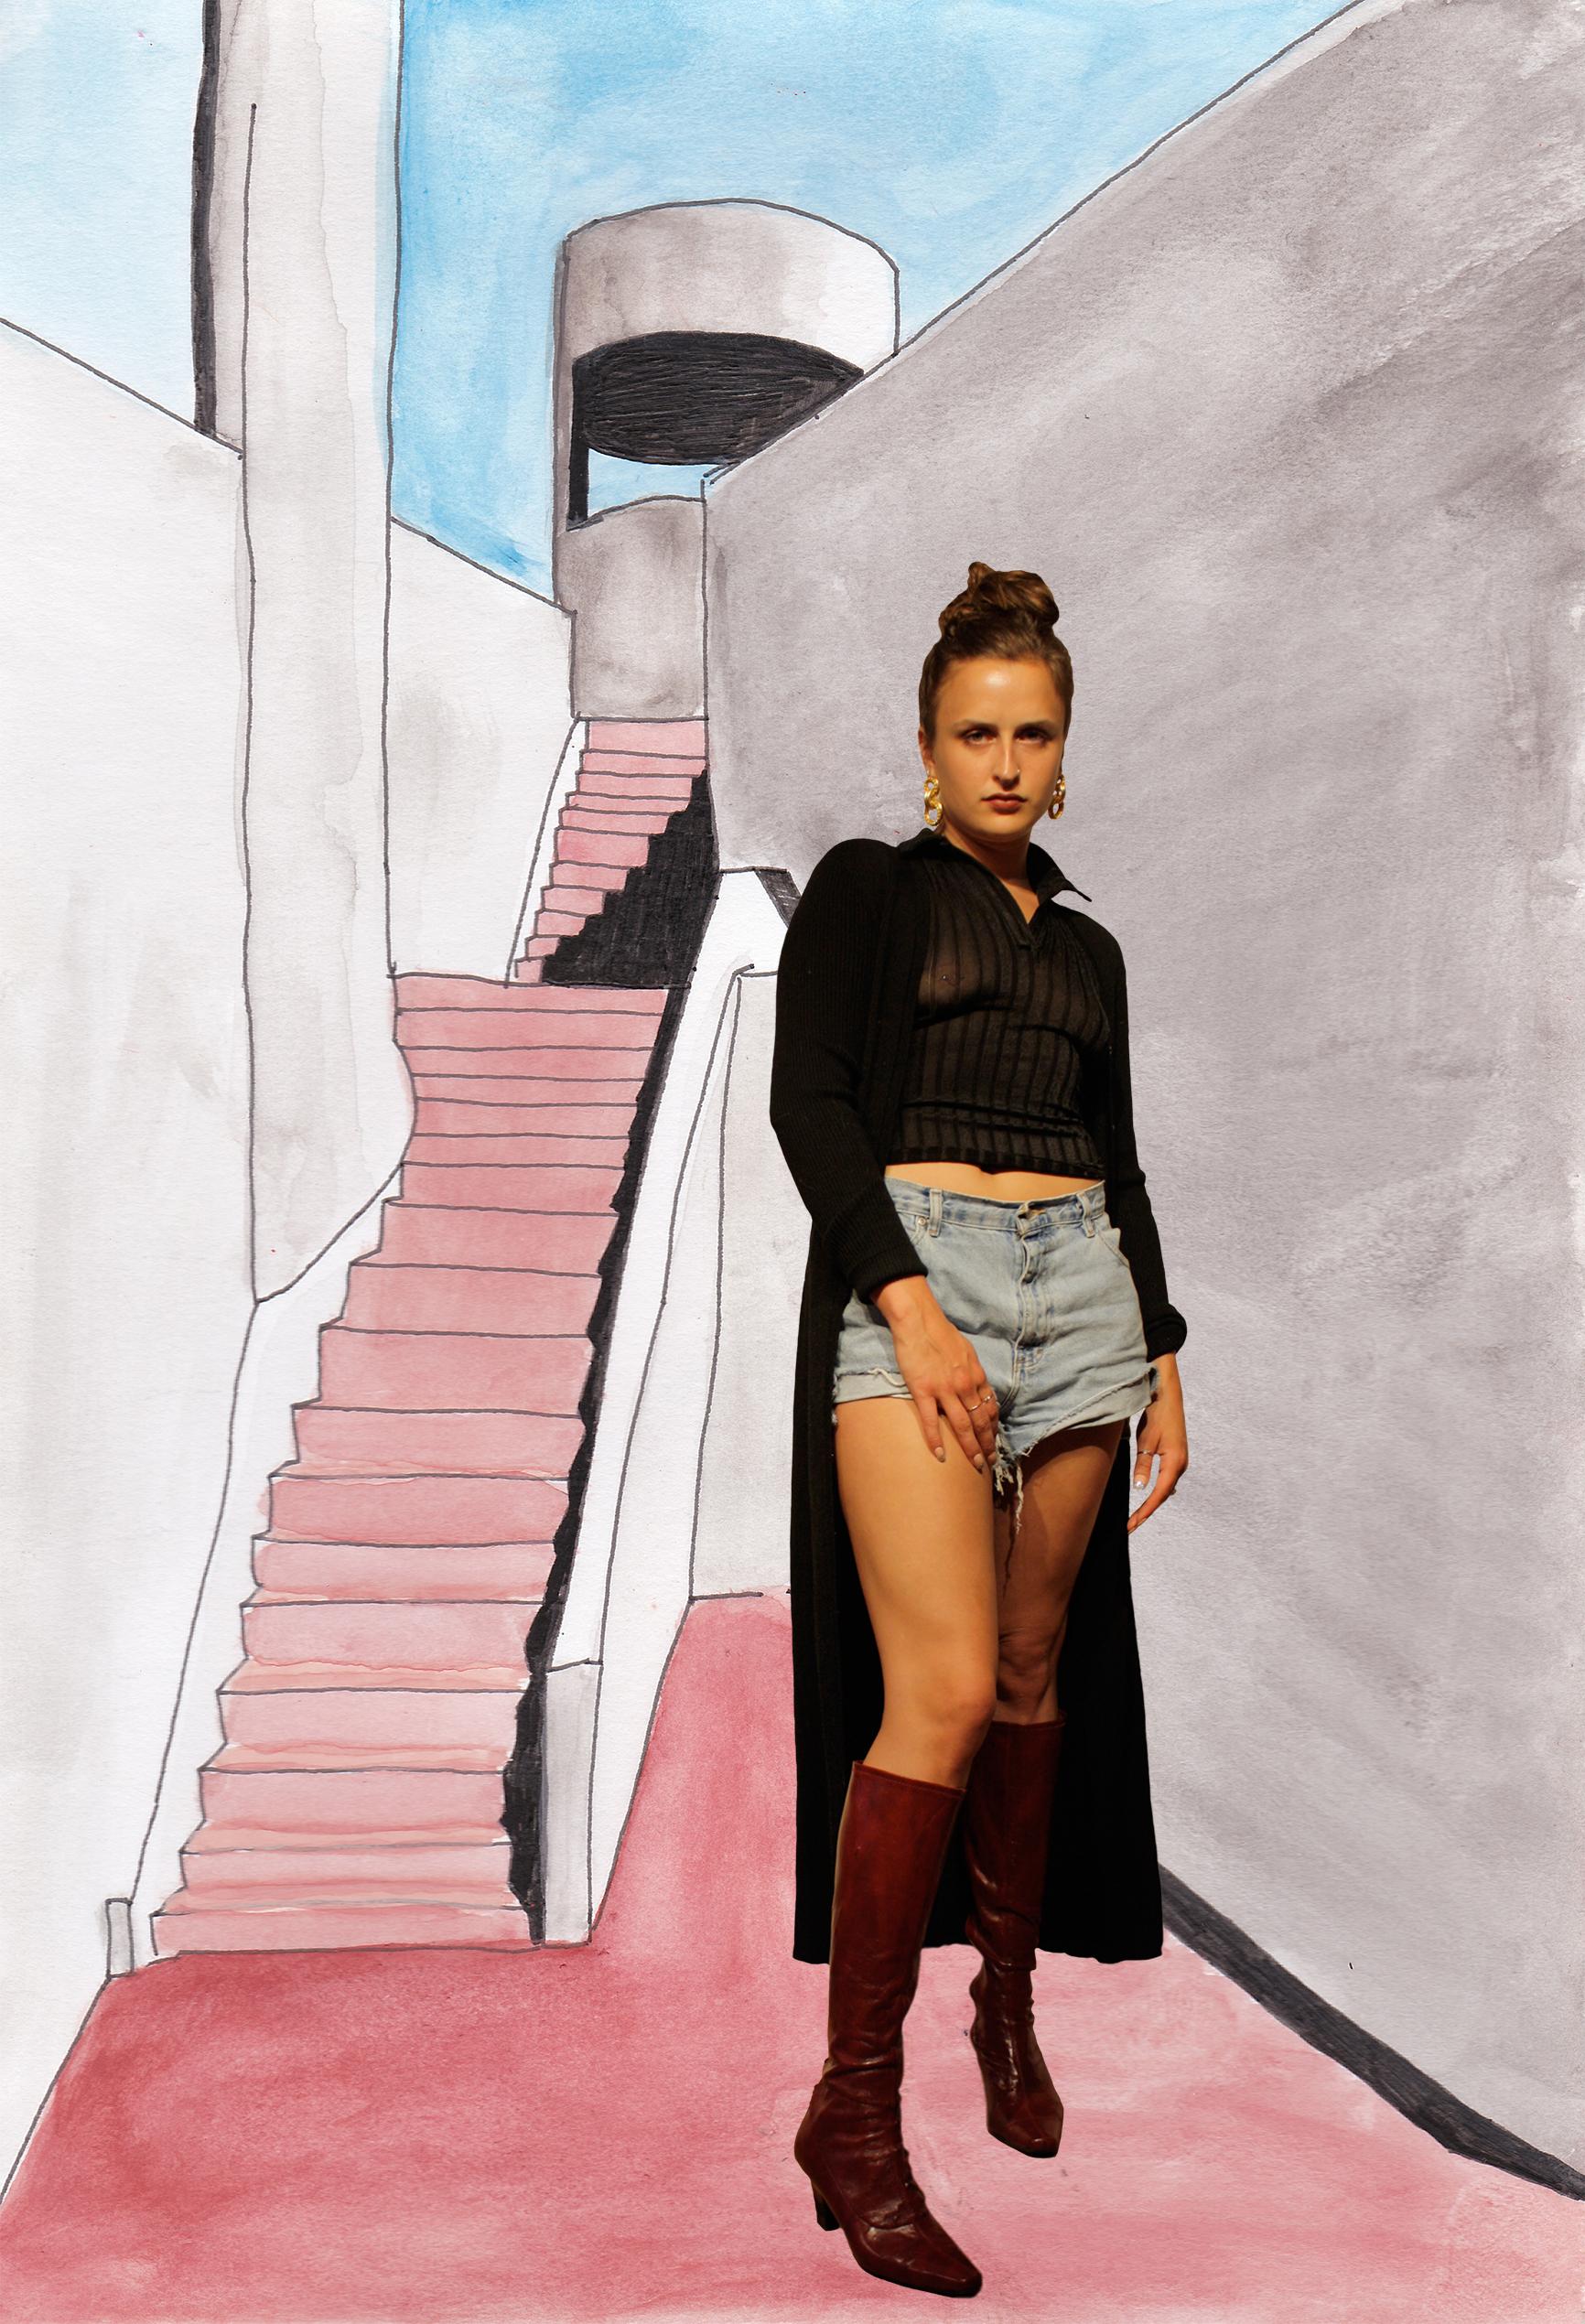 - Paintings by Caroline Jacobson